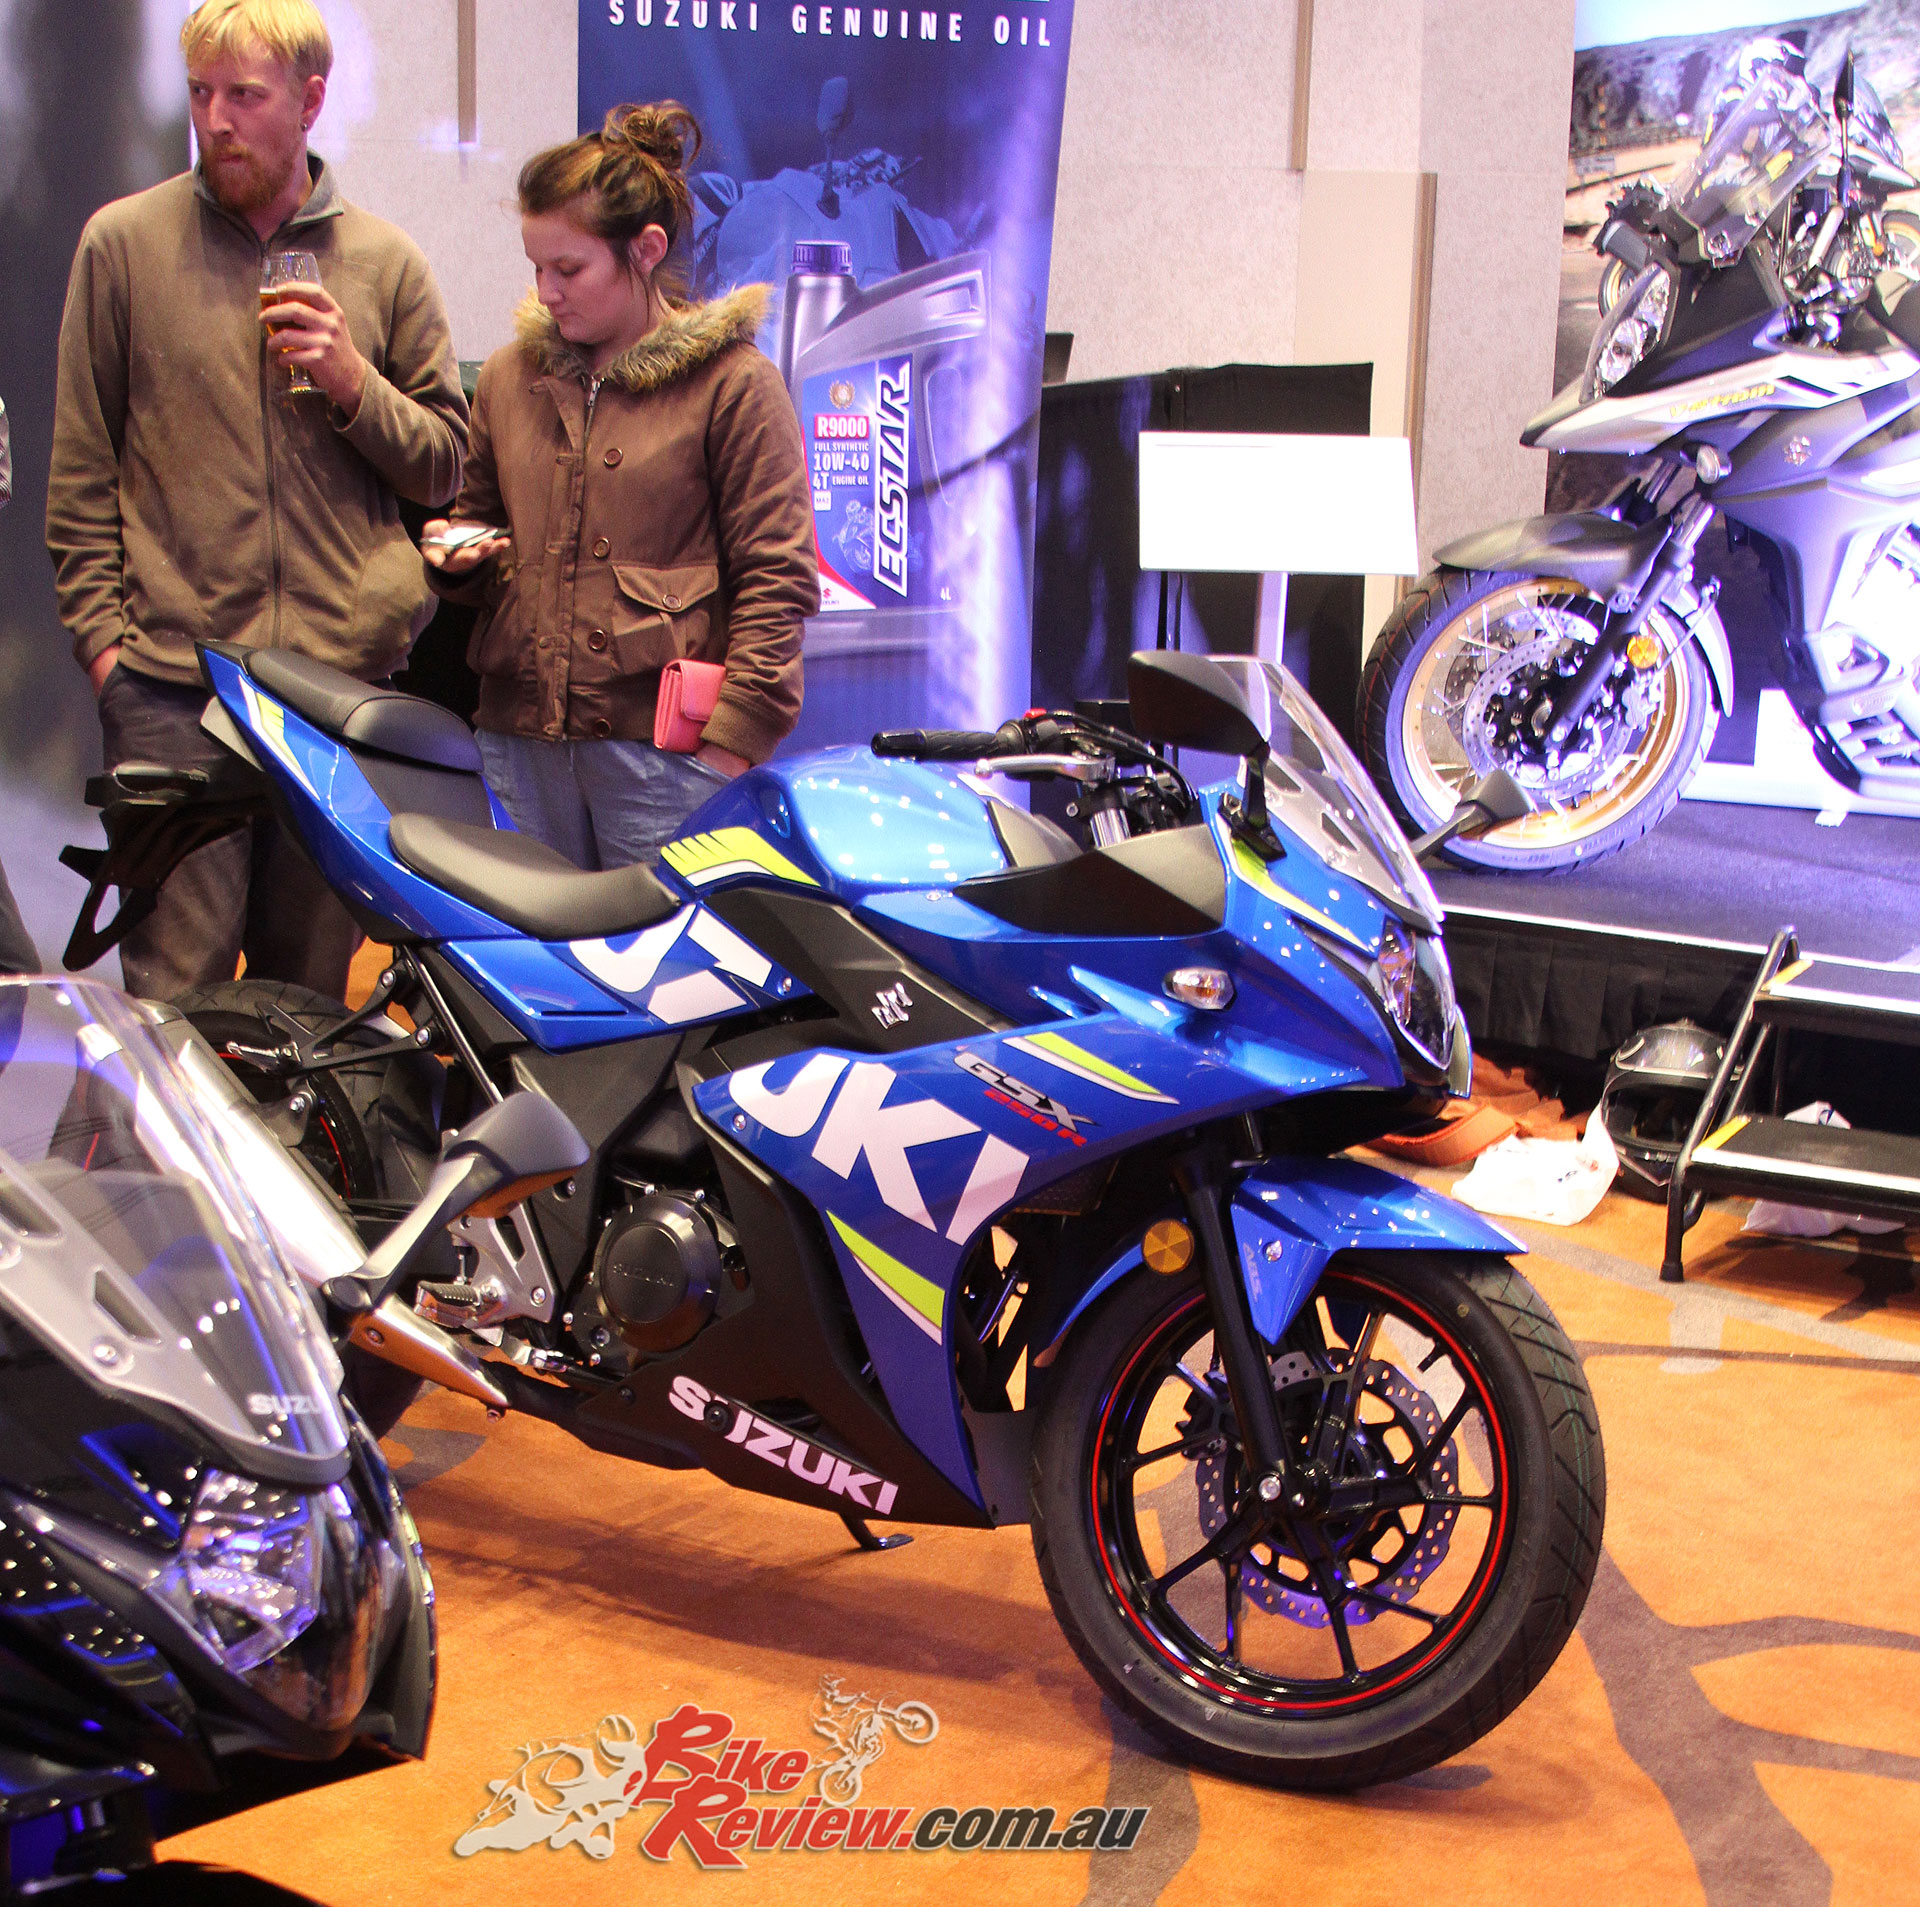 The new Suzuki GSX-R250 in race livery